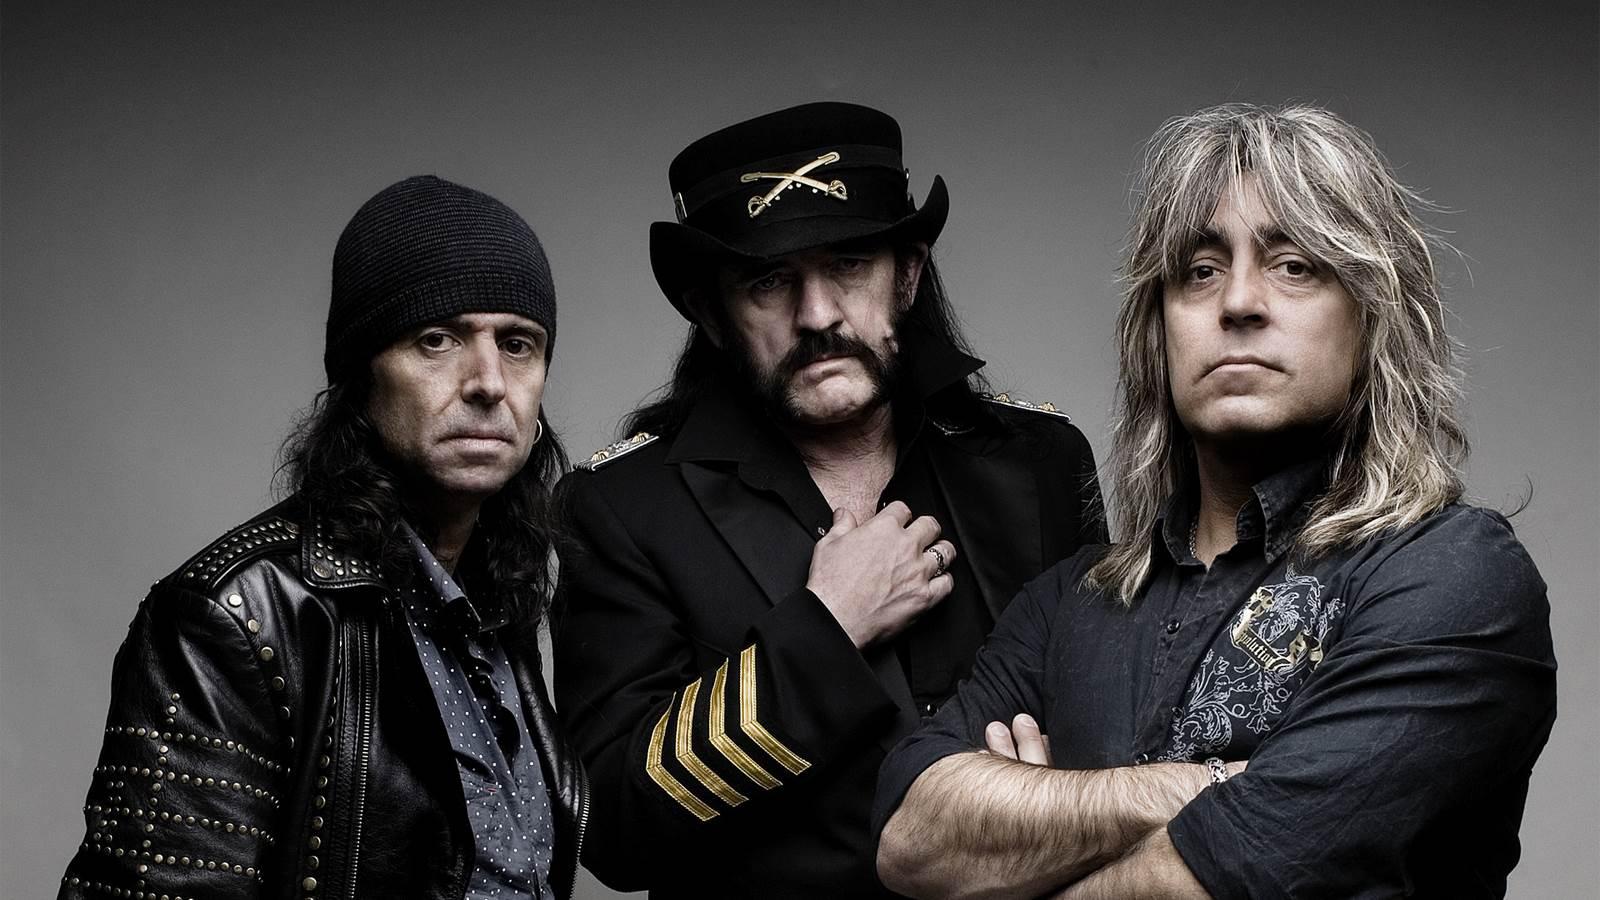 Muere Lemmy Kilmister a los 70 años lider de la banda de metal Motörhead 2015